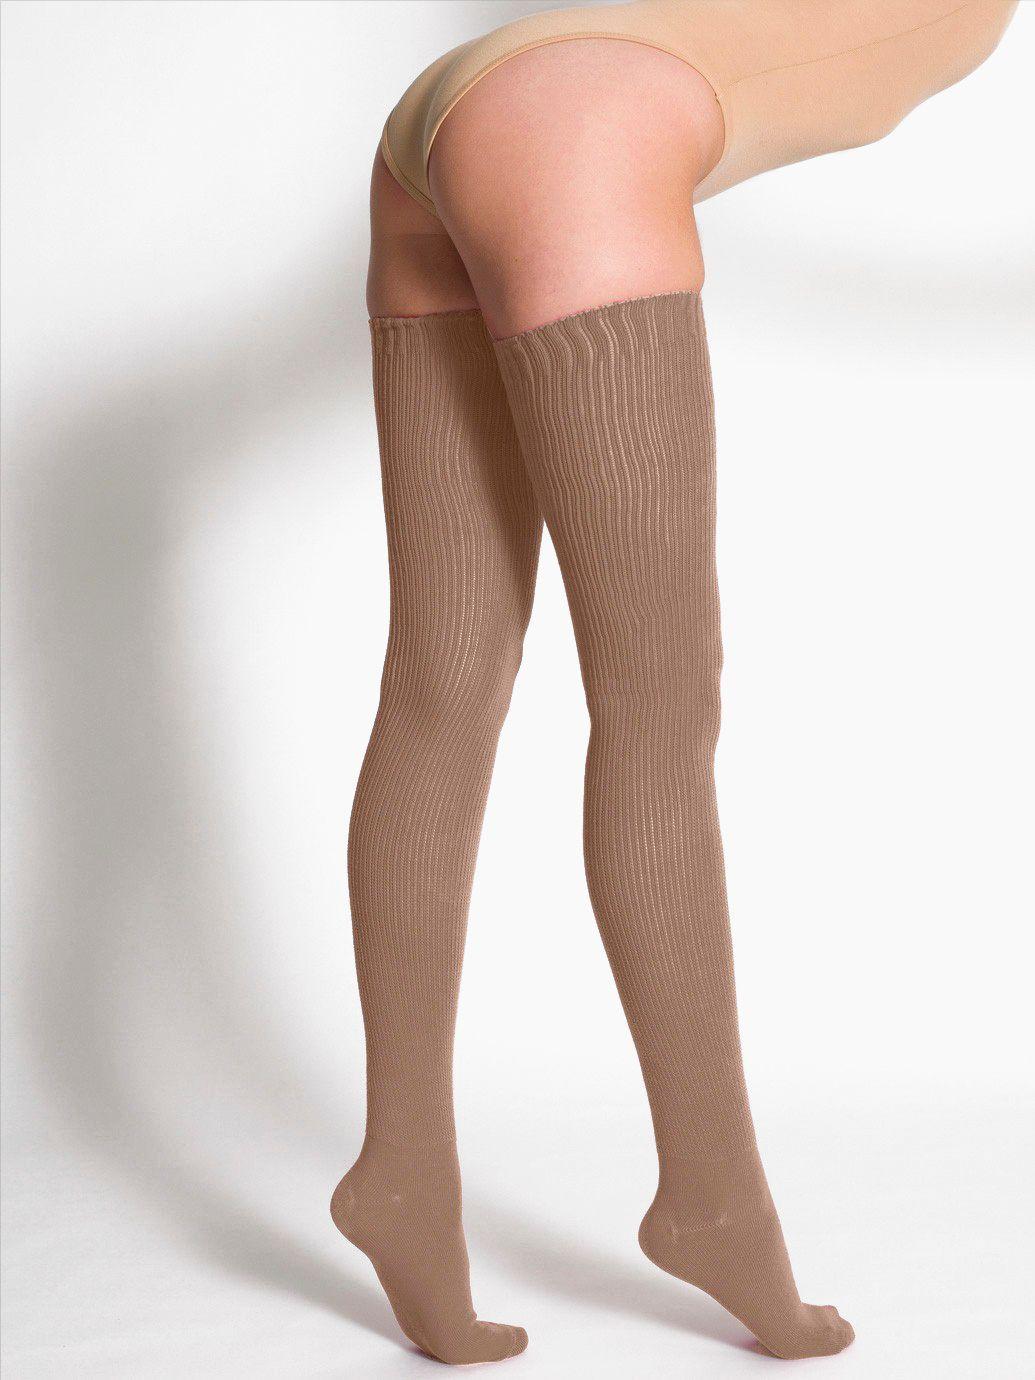 77b923dfa Thigh High socks for tall women